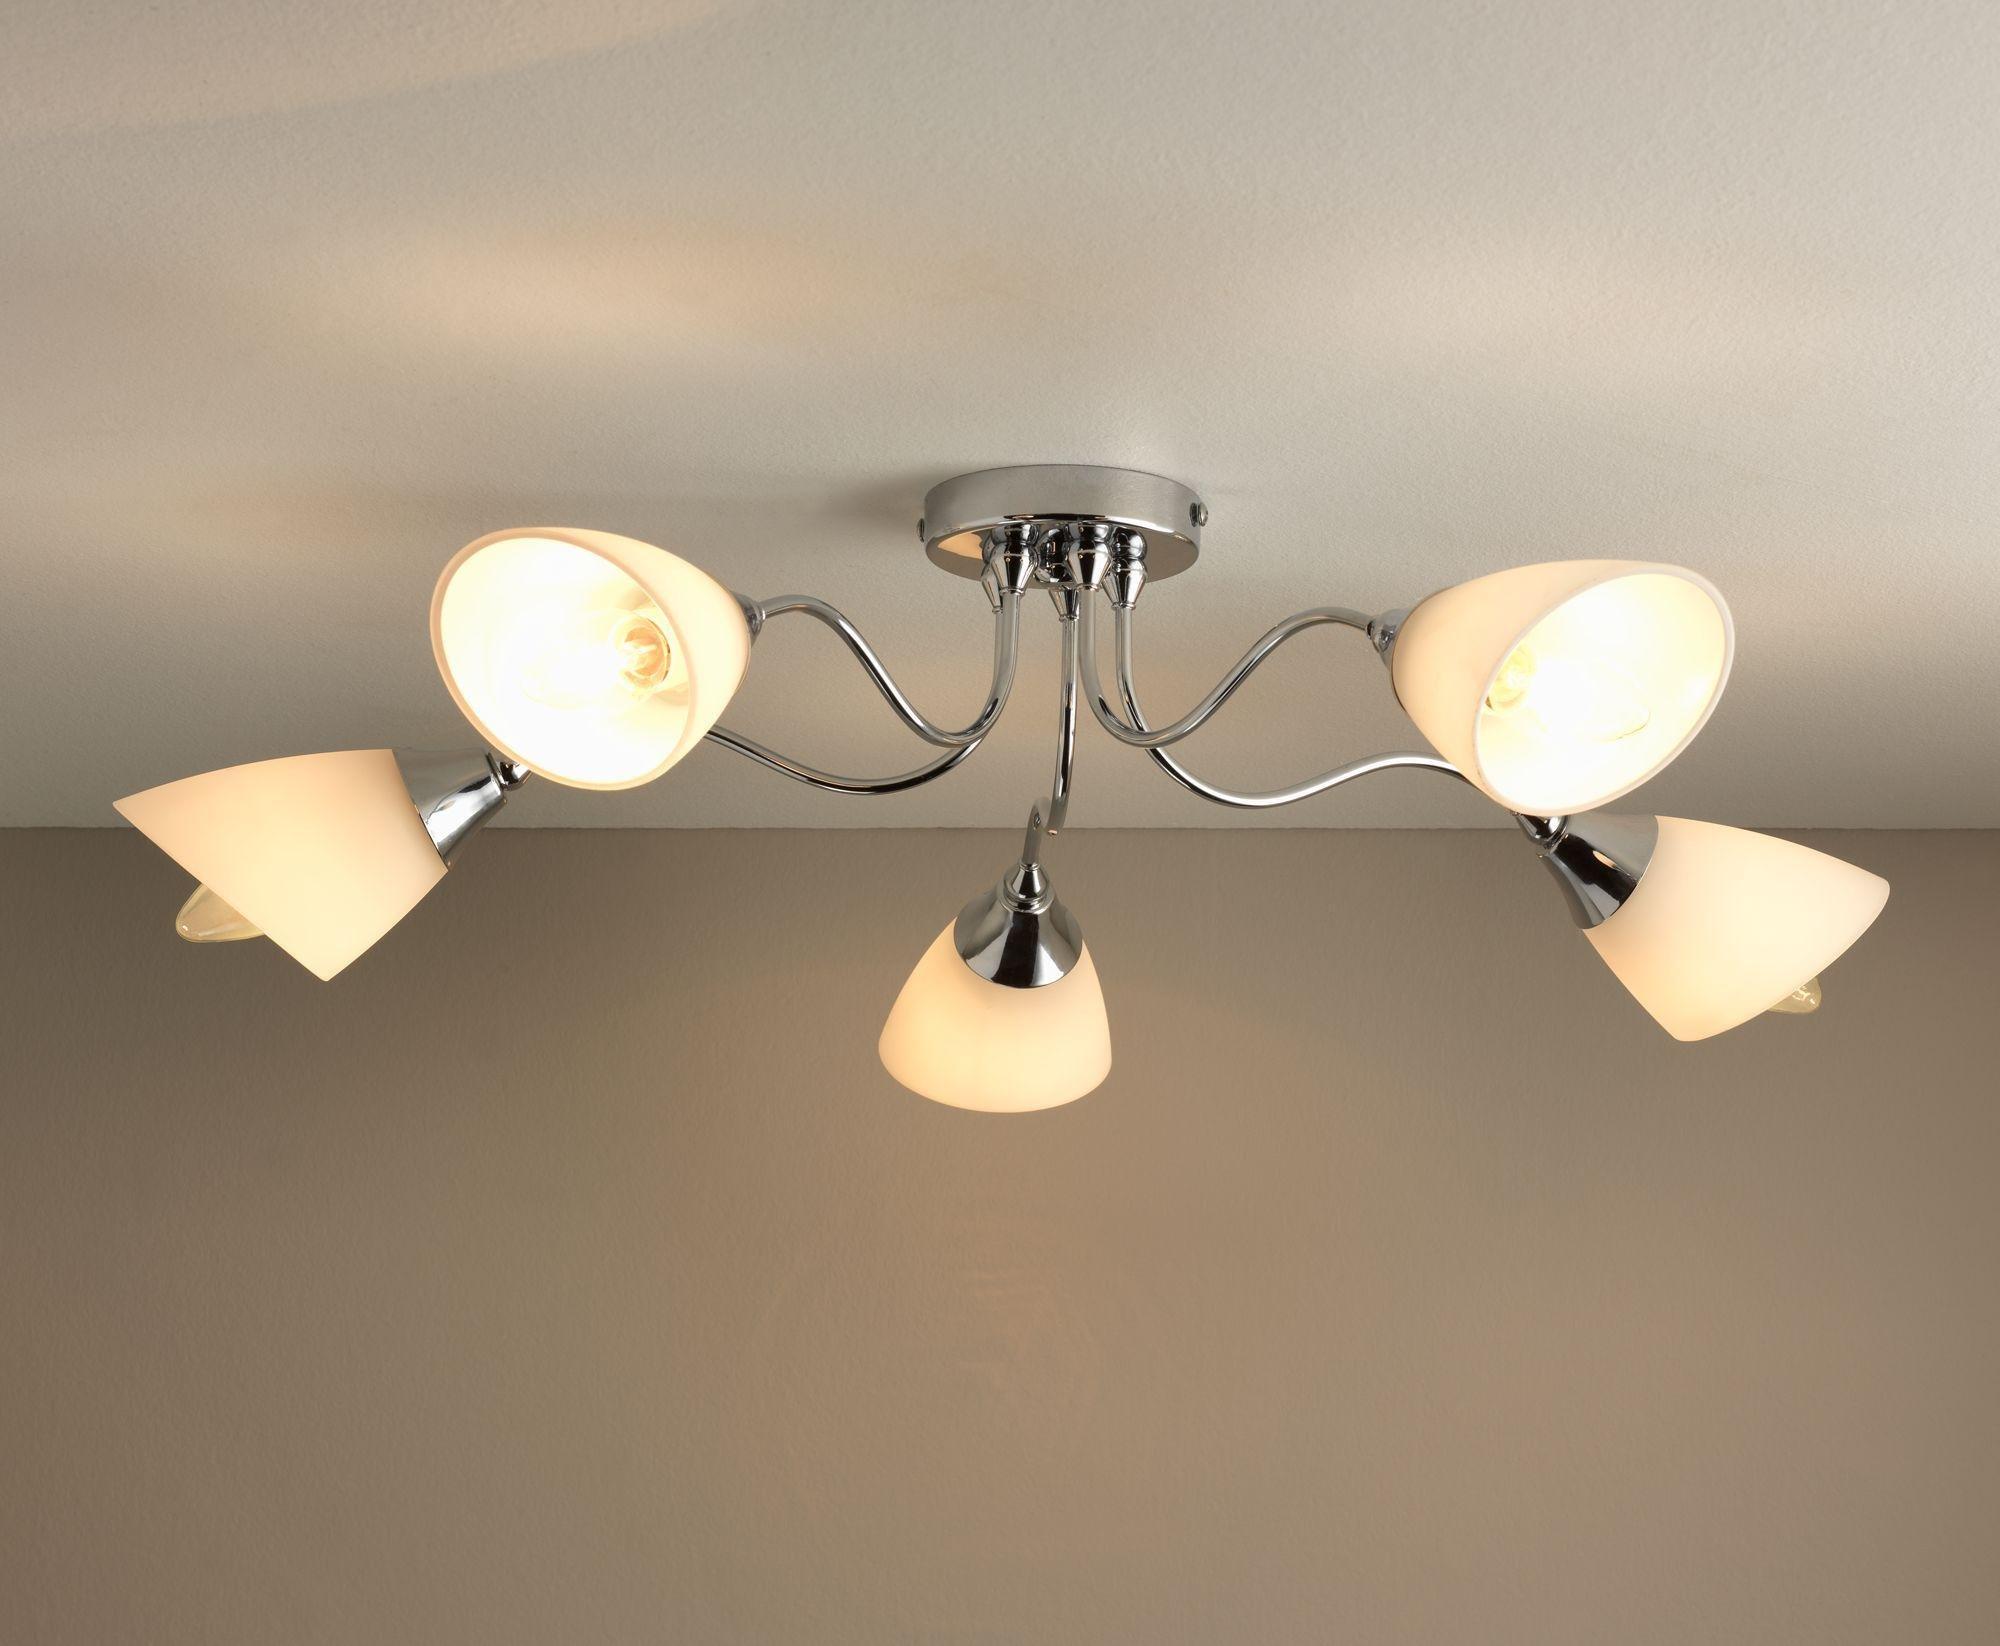 home cisco 5 light ceiling fitting review. Black Bedroom Furniture Sets. Home Design Ideas